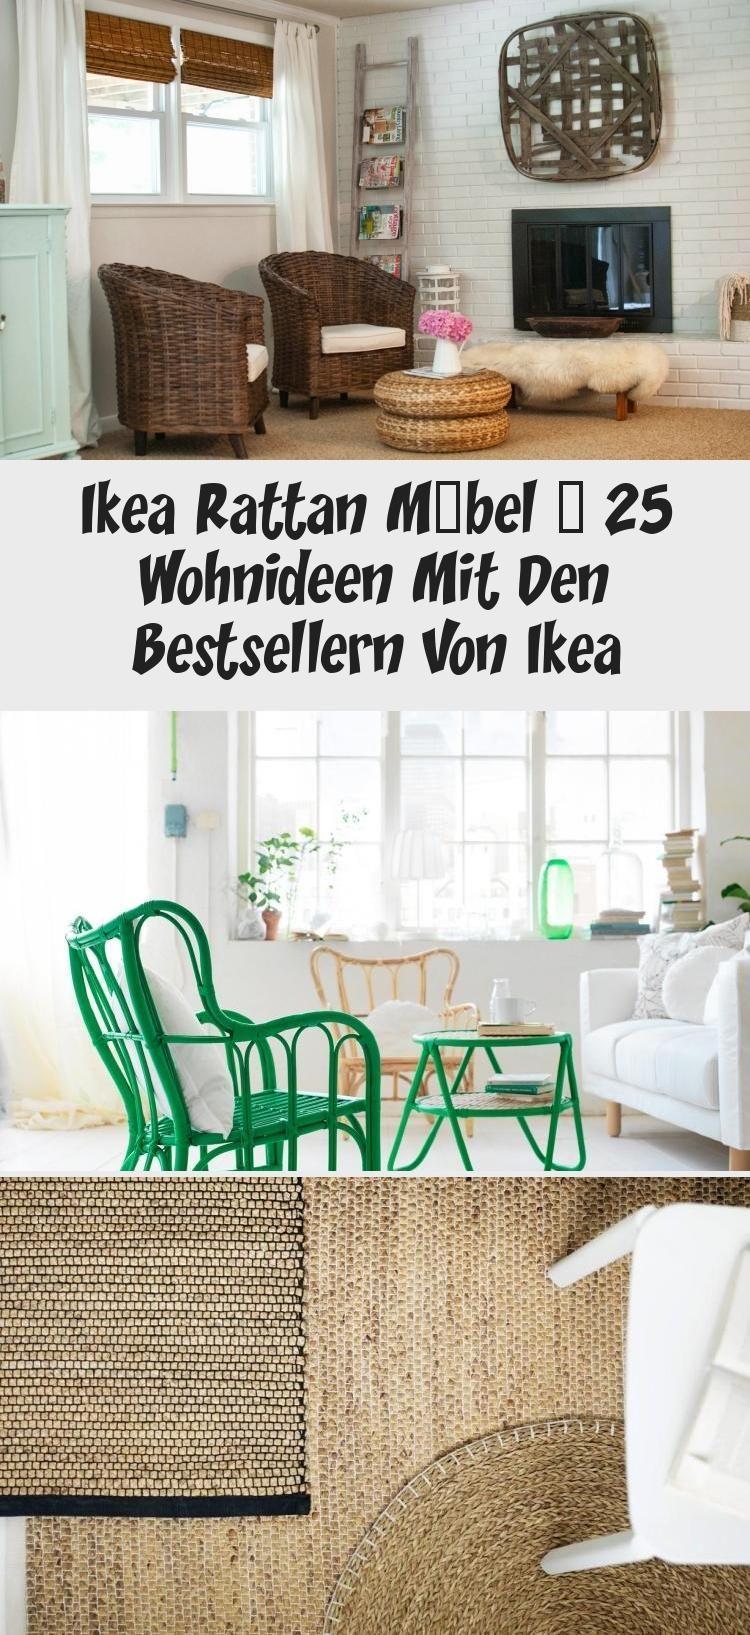 Rattanstuhl Esszimmer Ikea